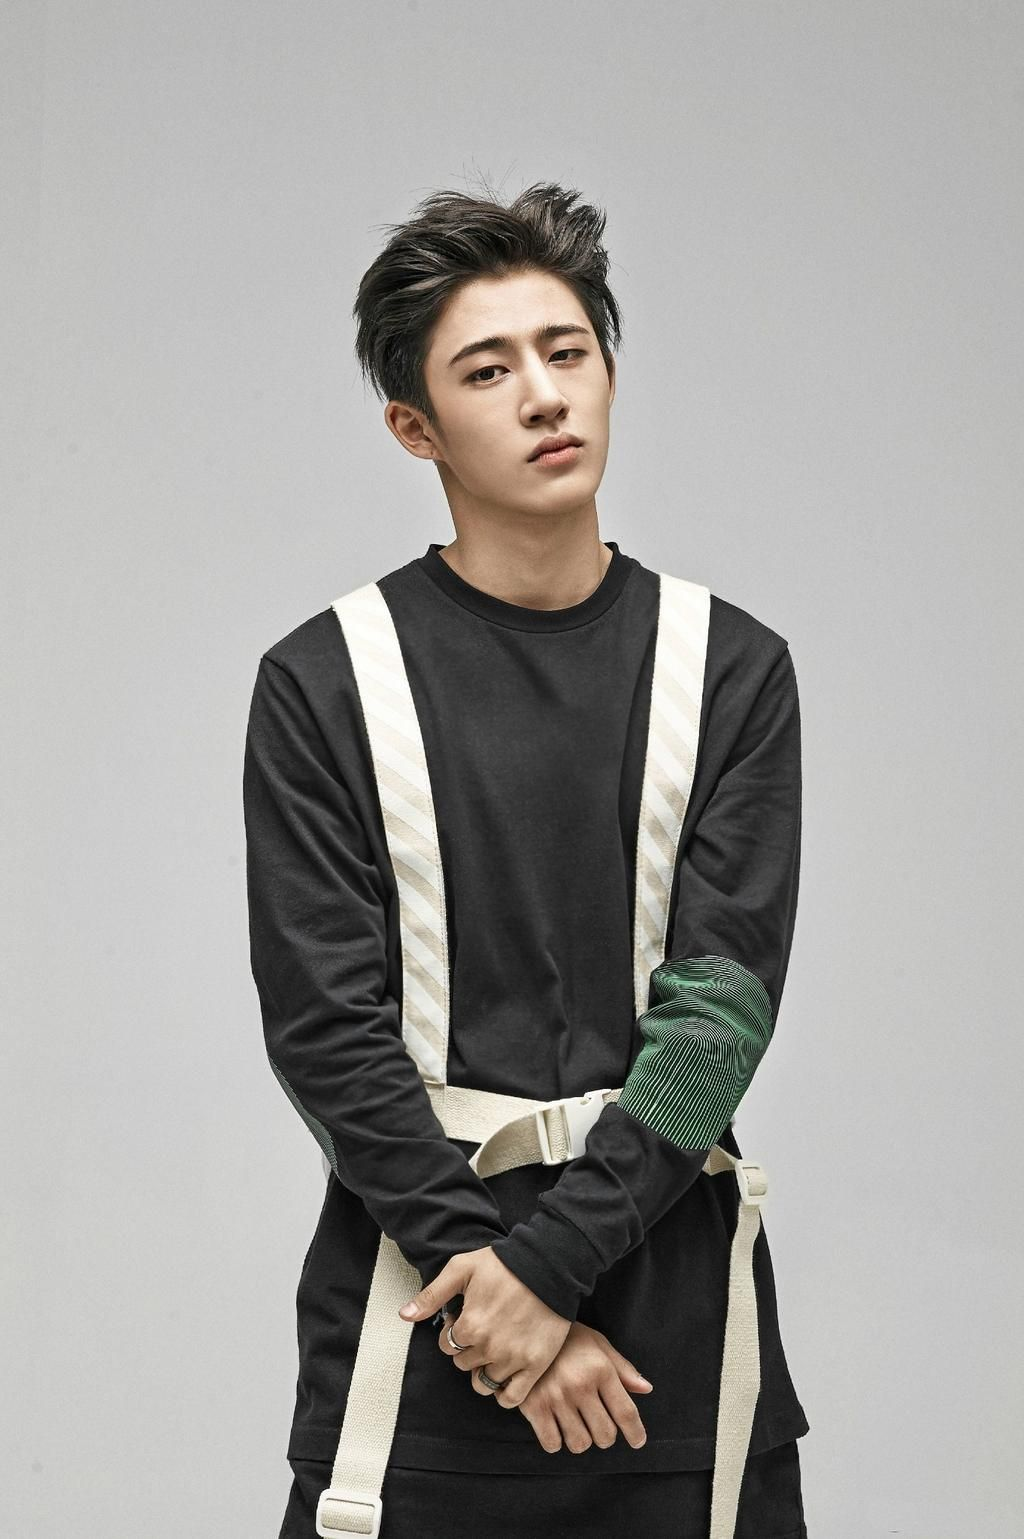 Ikon S Leader B I Aka Hanbi The Charisma Rapper Ikon Leader Ikon Mix And Match Ikon